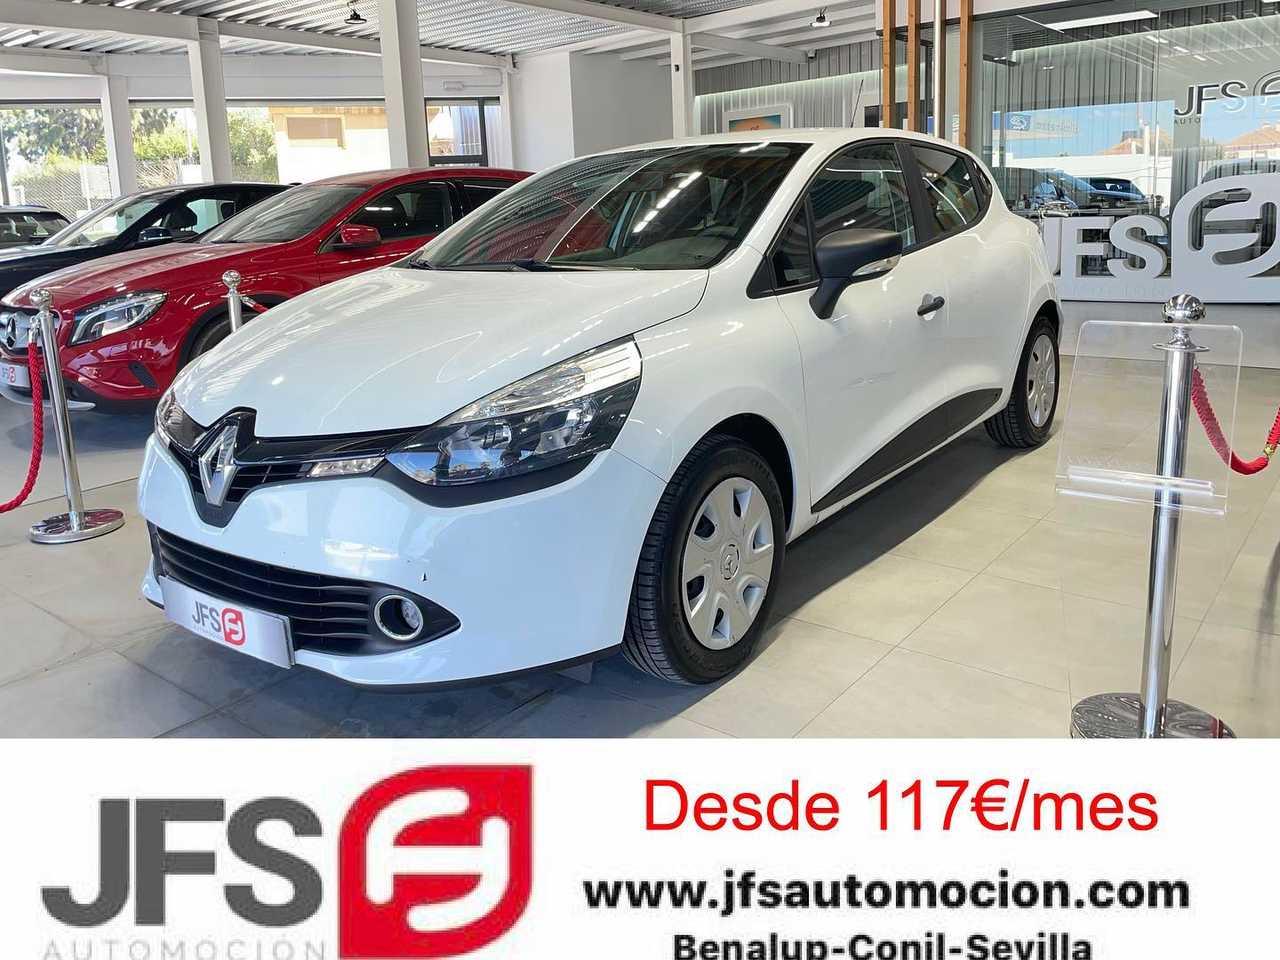 Renault Clio 1.5 DCI 75 cv   - Foto 1